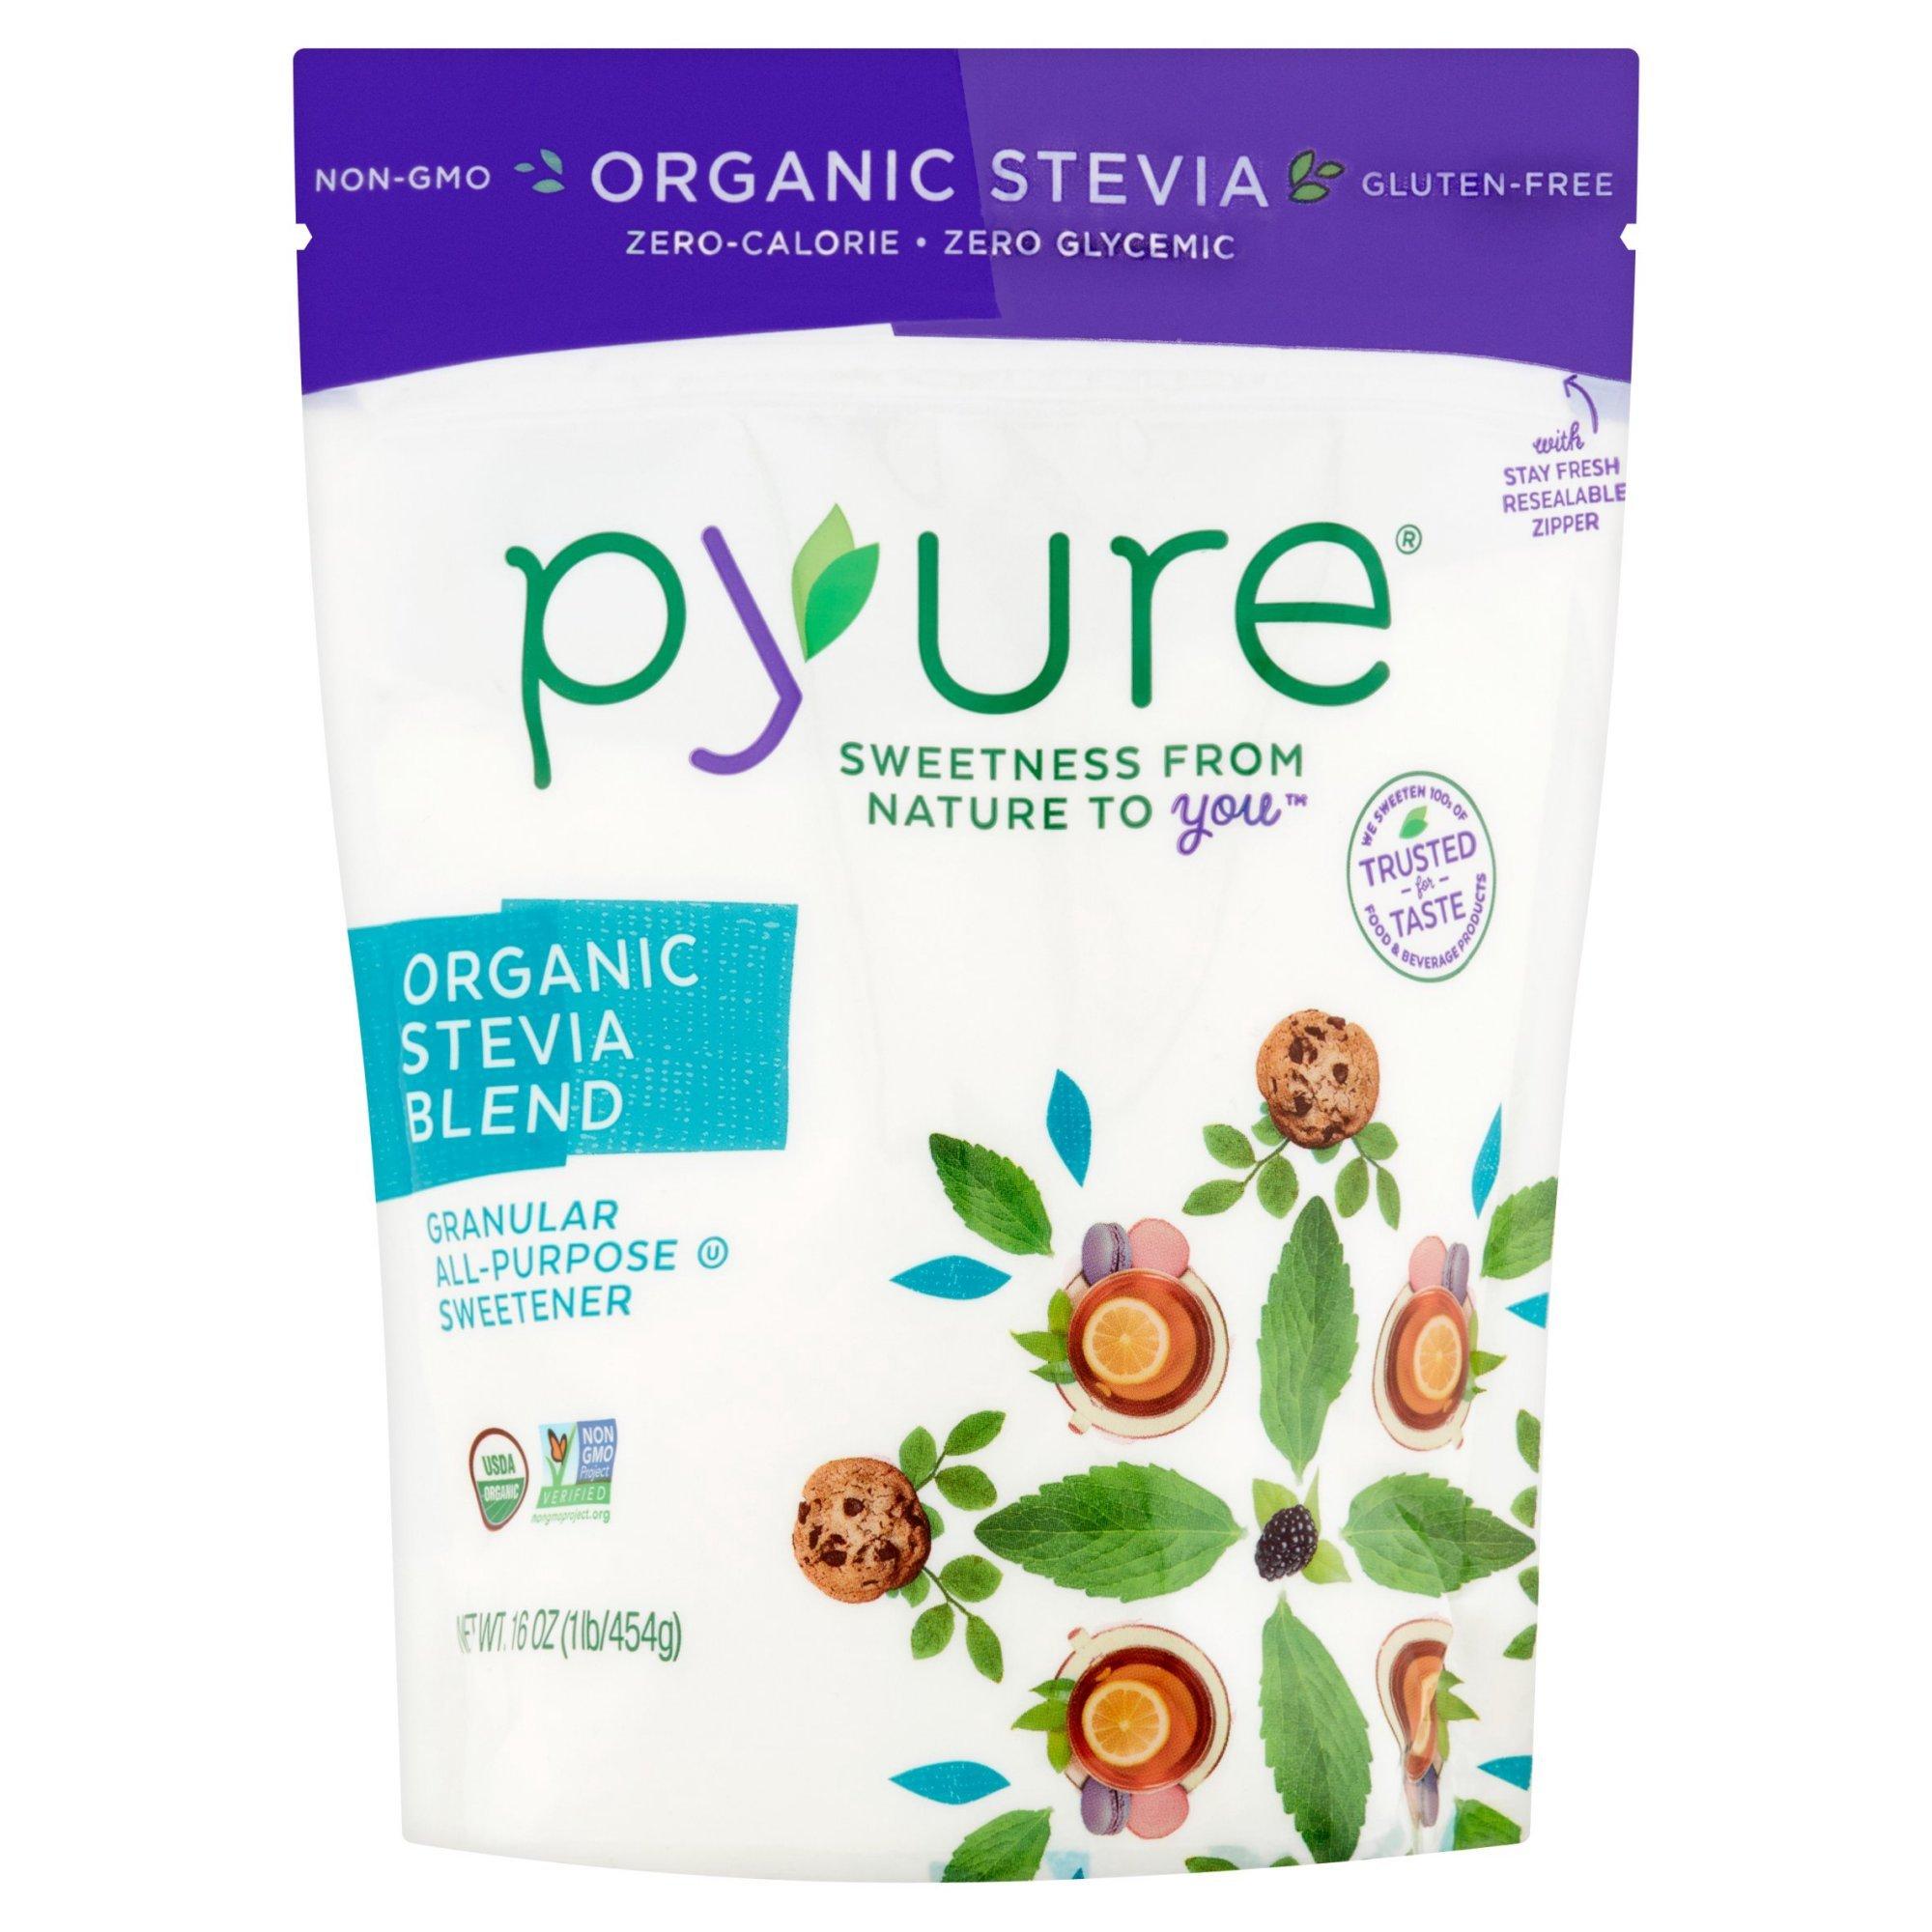 Pyure Organic Stevia Blend Granular All-Purpose Sweetener, 16 oz (Pack of 3)